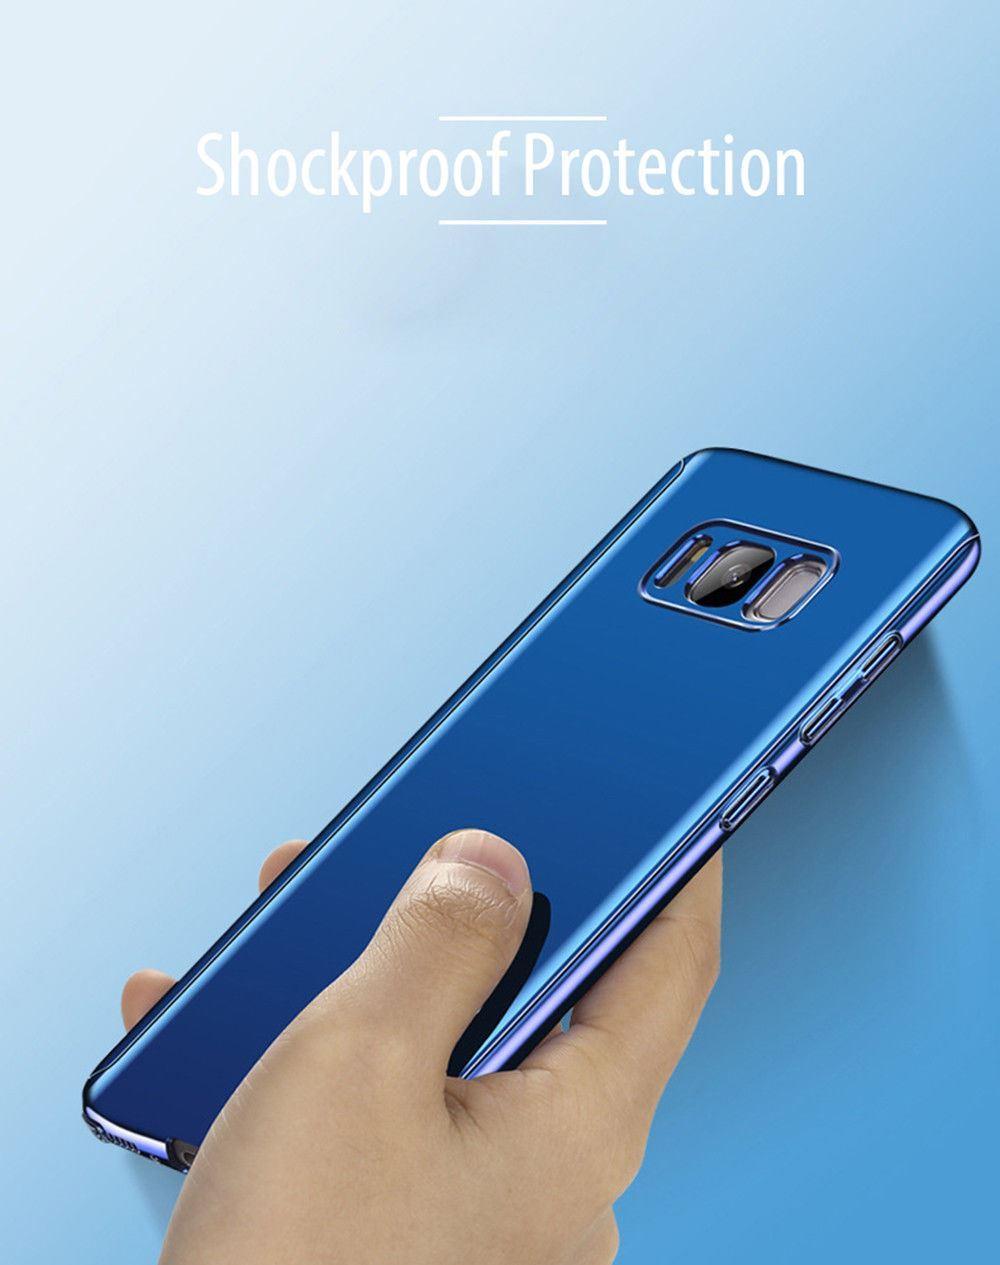 Shockproof-Hybrid-360-Ultra-Thin-Mirror-Hard-Case-Samsung-Galaxy-S7-edge-S8-S9 thumbnail 14